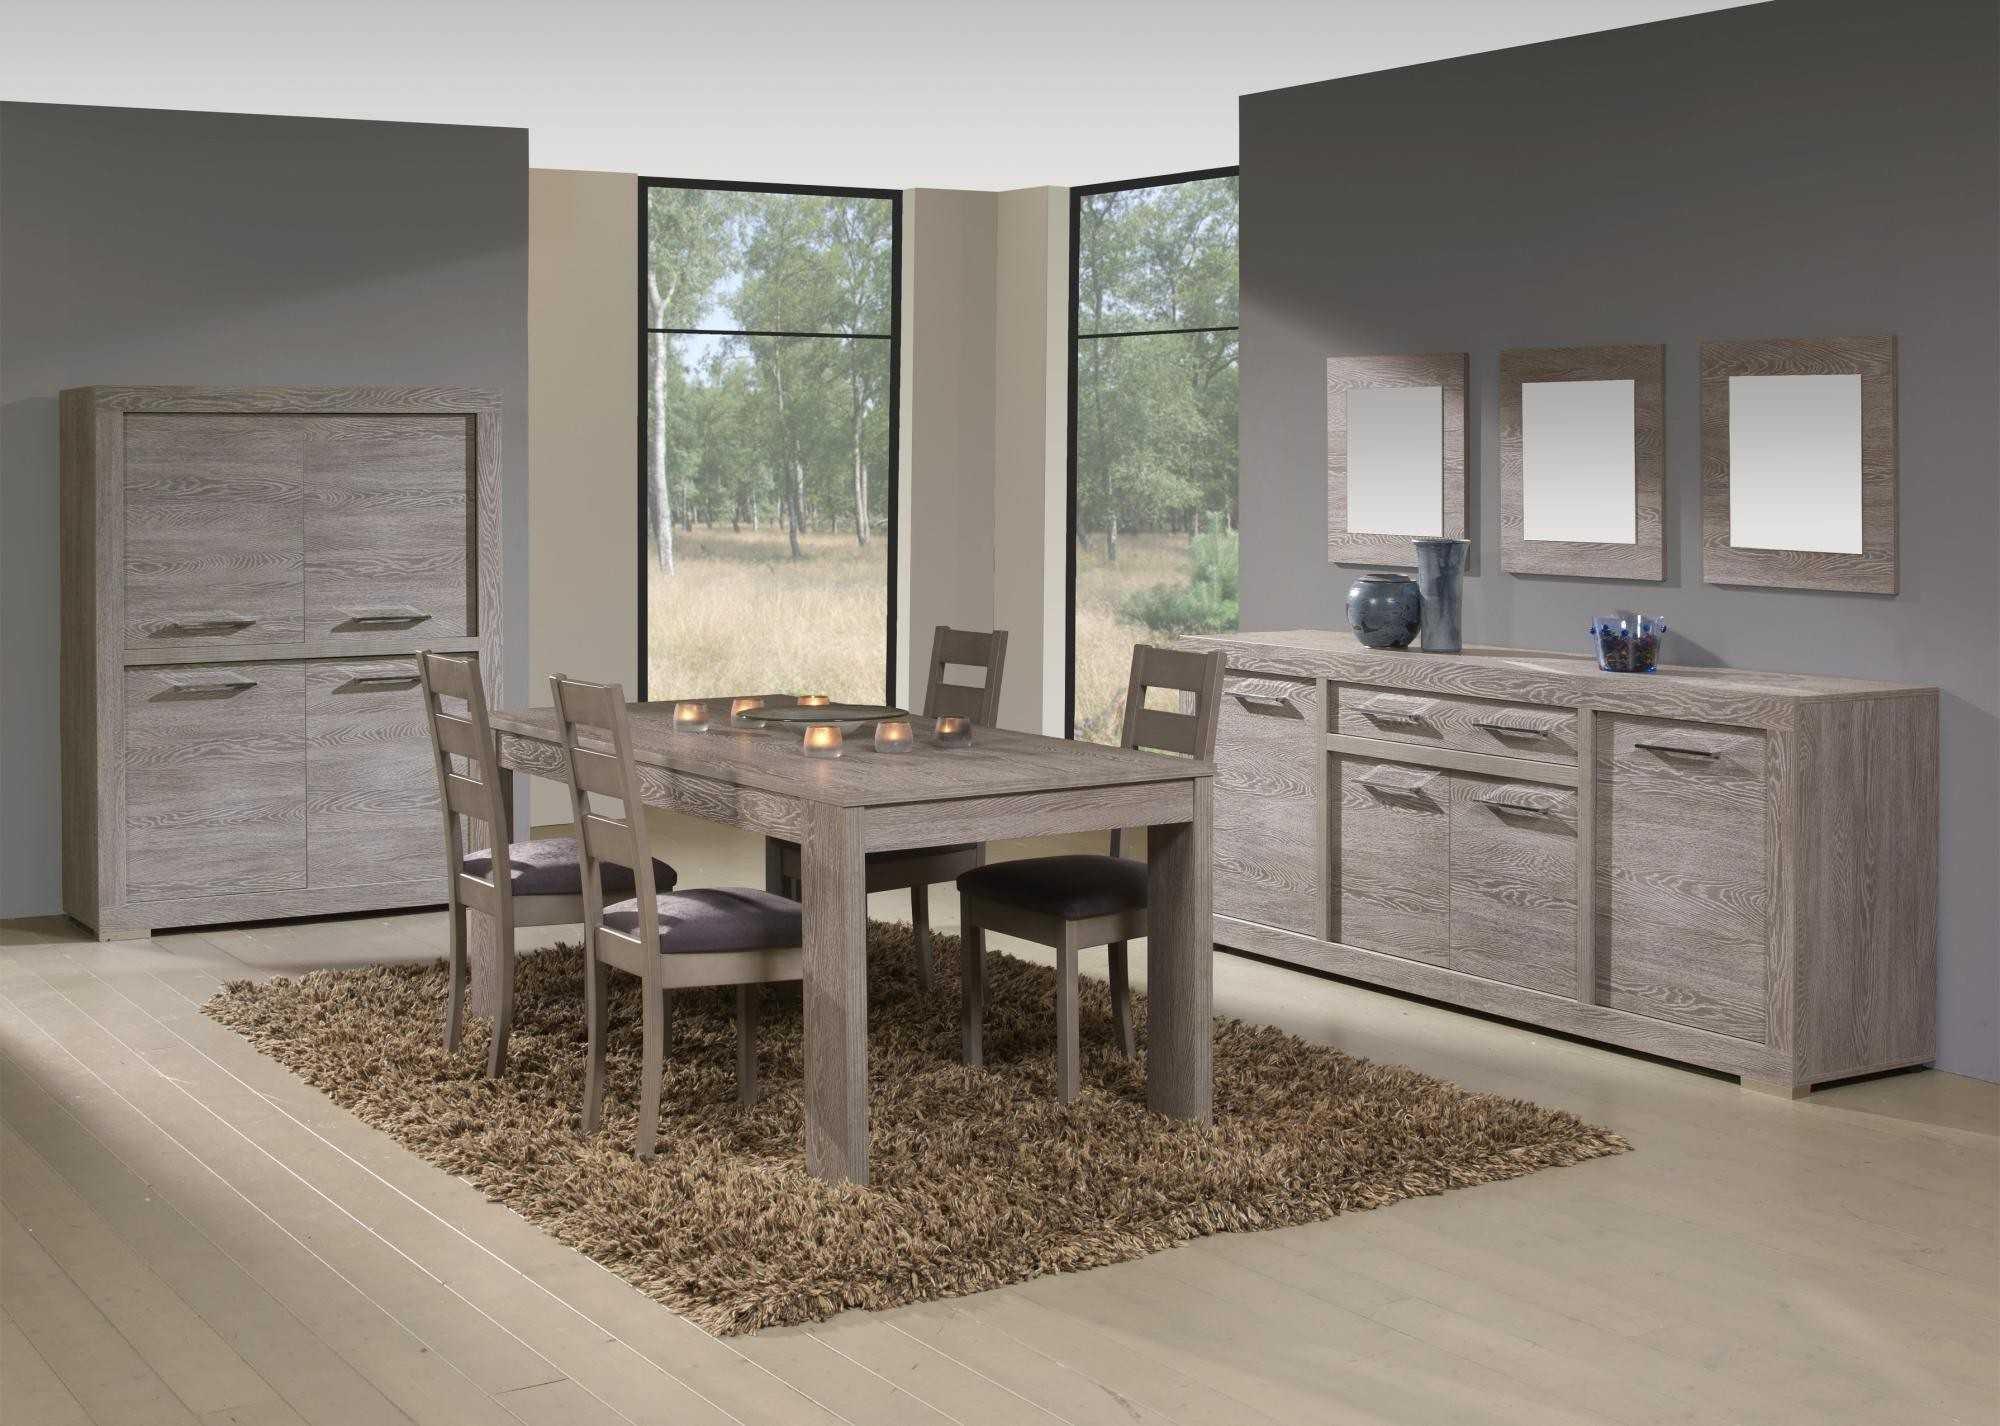 Meubles salle manger but impressionnant collection hauteur standard chaise de cuisine tags for Salle a manger stone but